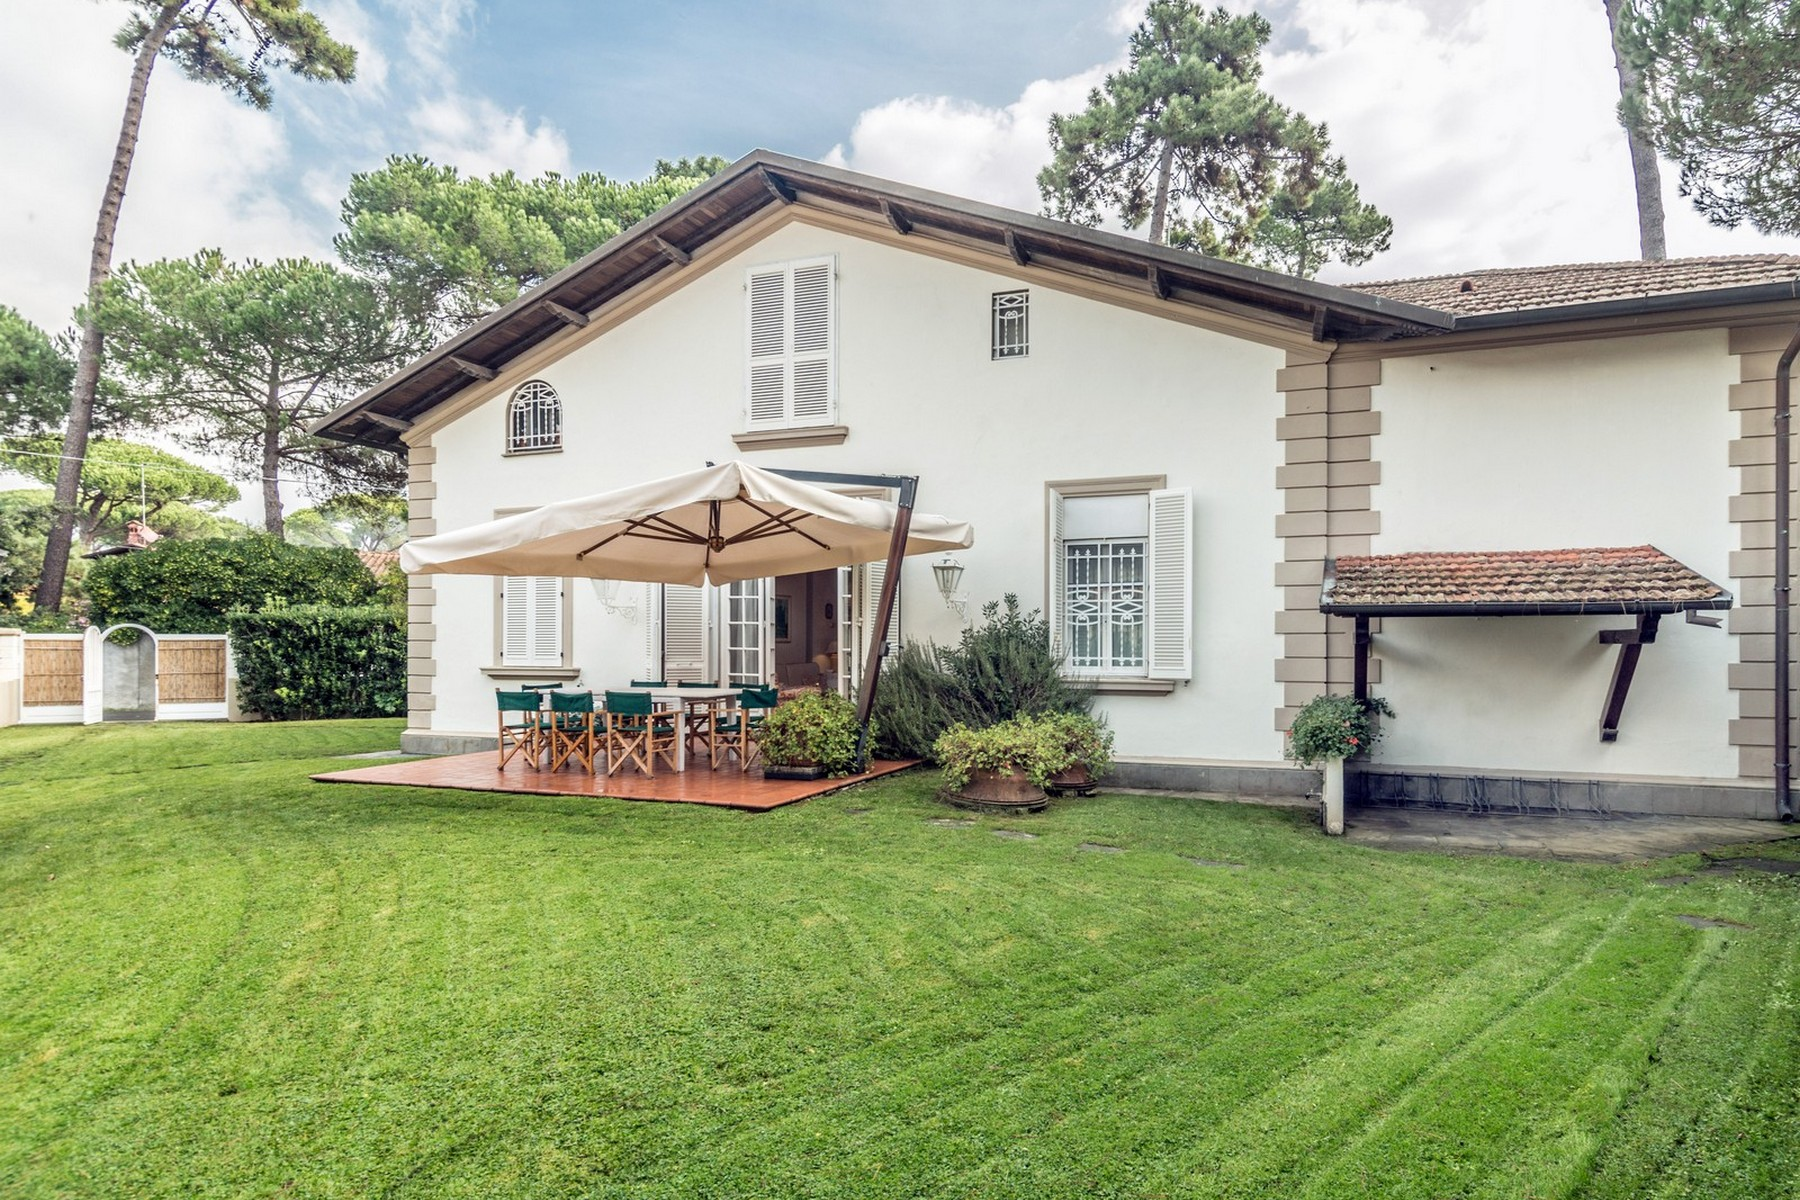 Einfamilienhaus für Verkauf beim Incomparable property in Forte dei Marmi Roma Imperiale Forte Dei Marmi, Lucca 50100 Italien